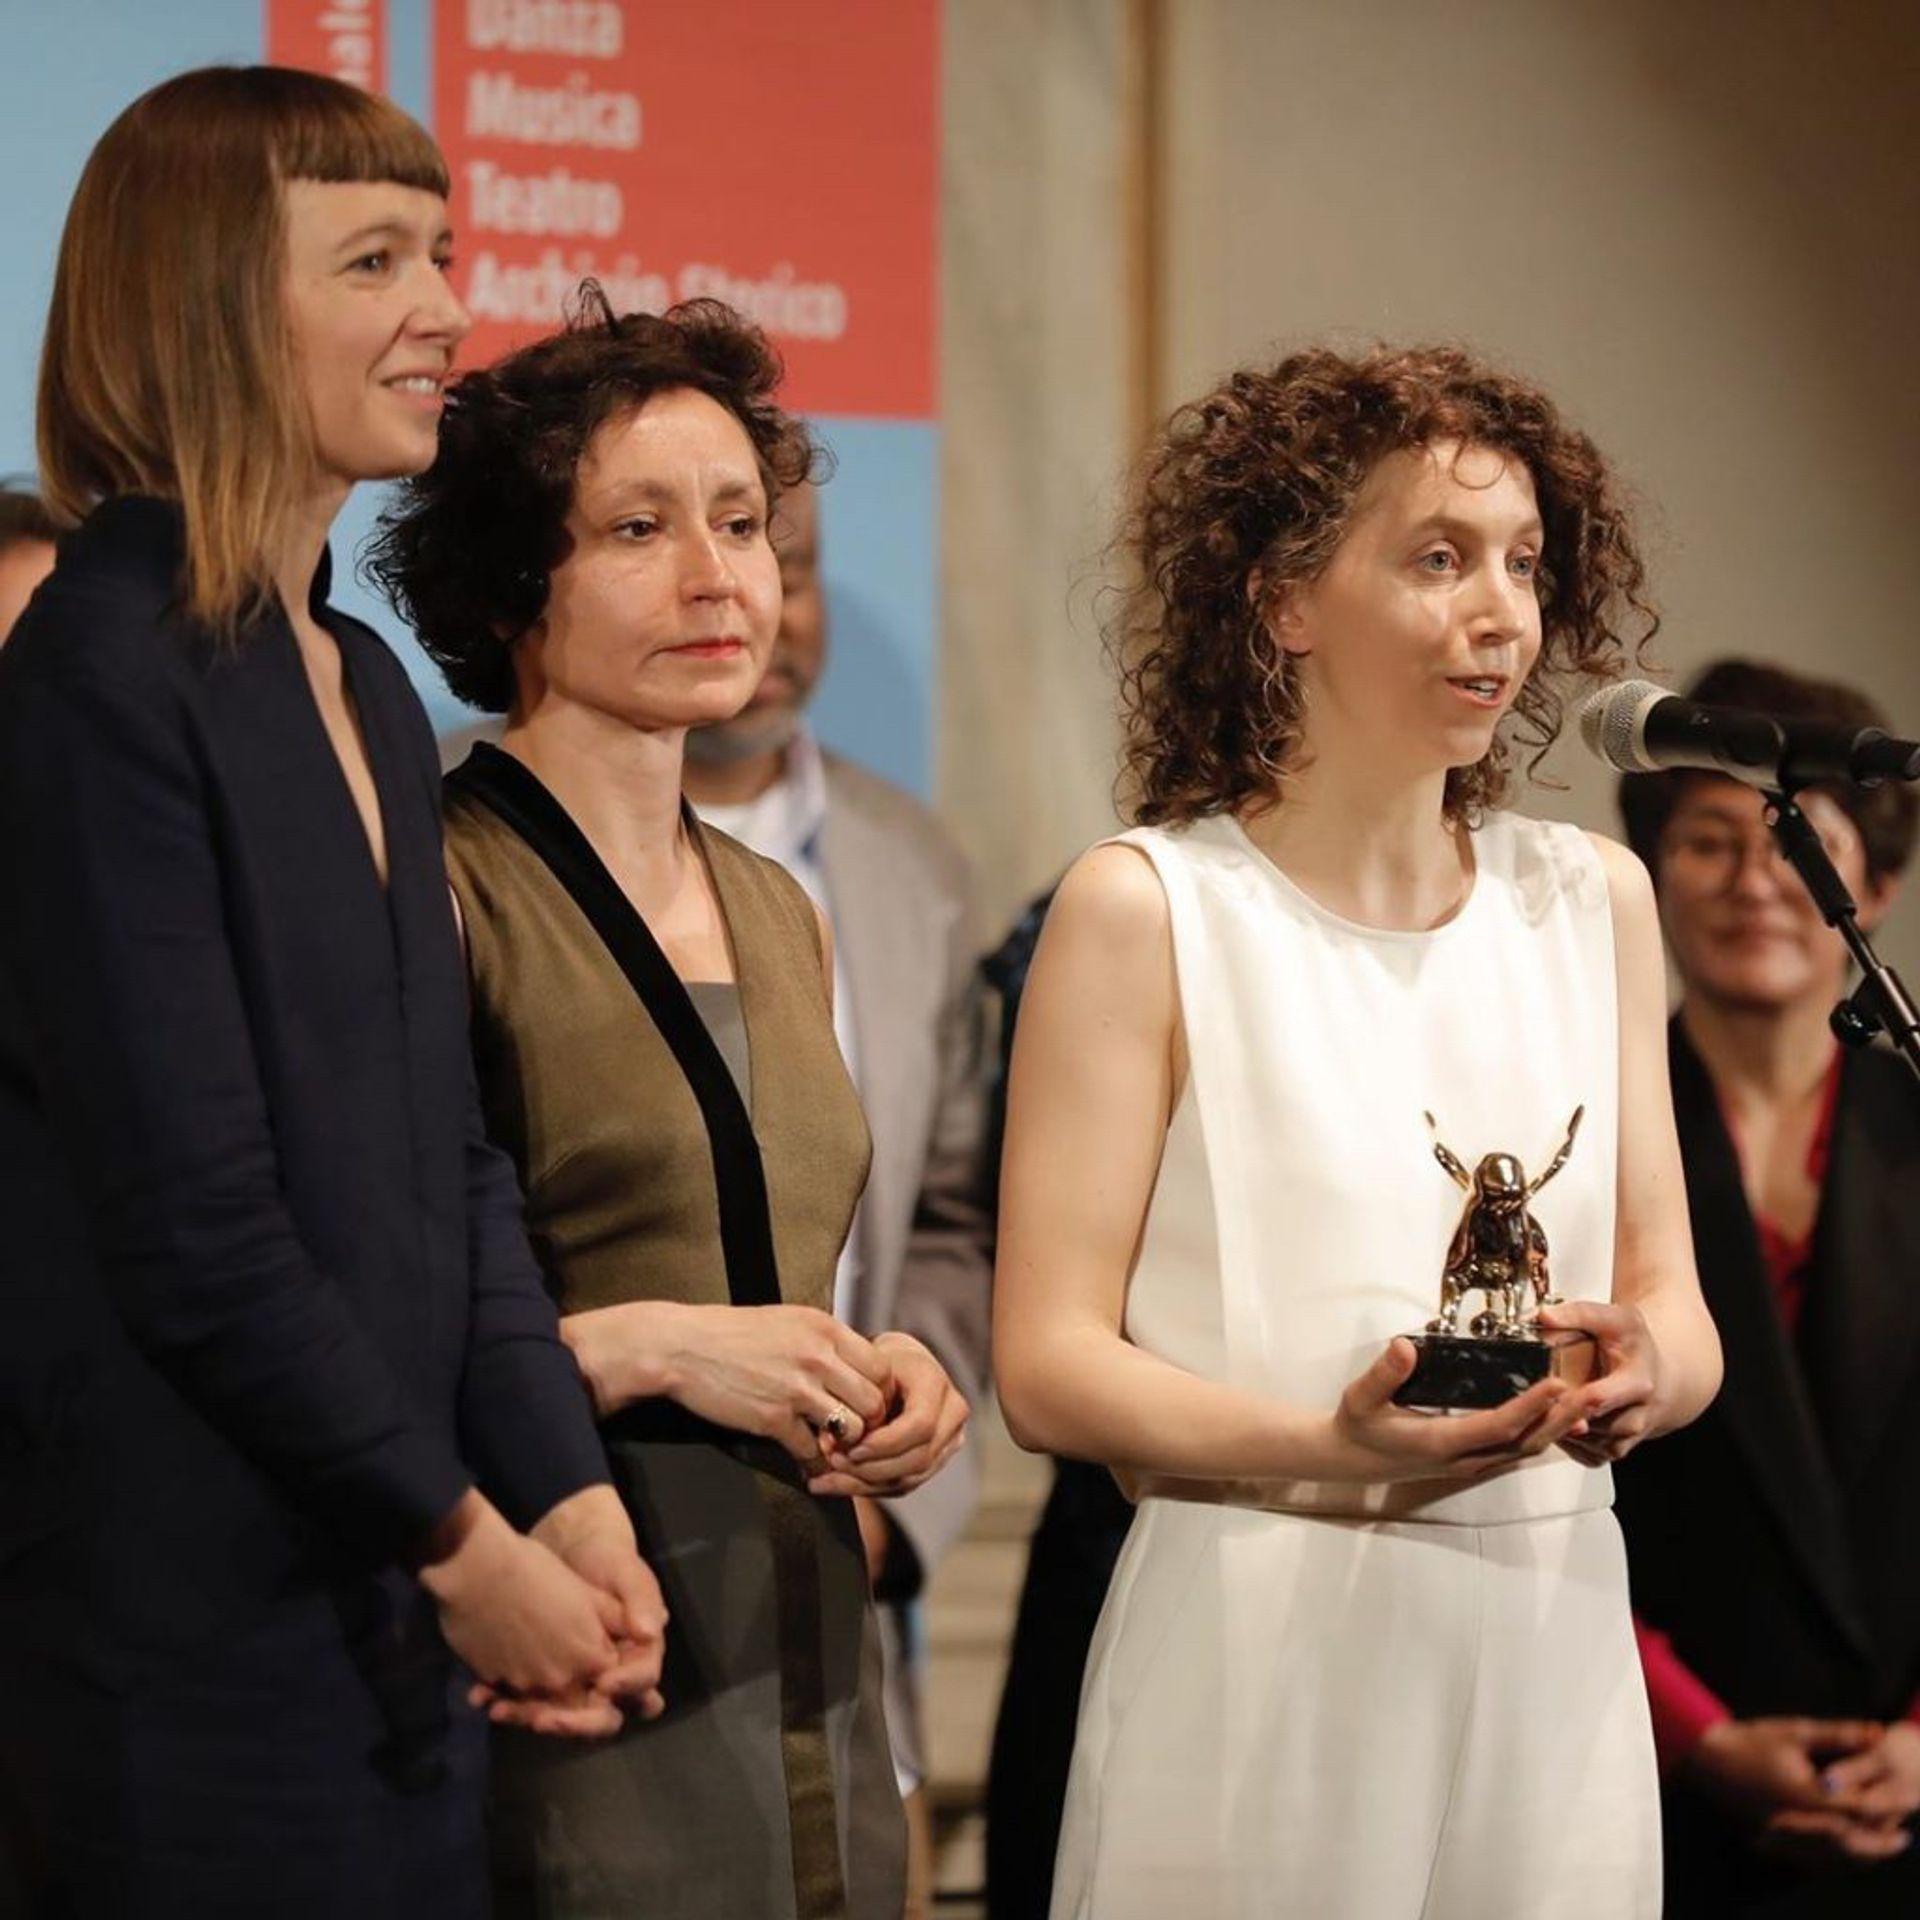 Rugilė Barzdžiukaitė accepts the Golden Lion courtesy Venice Biennale